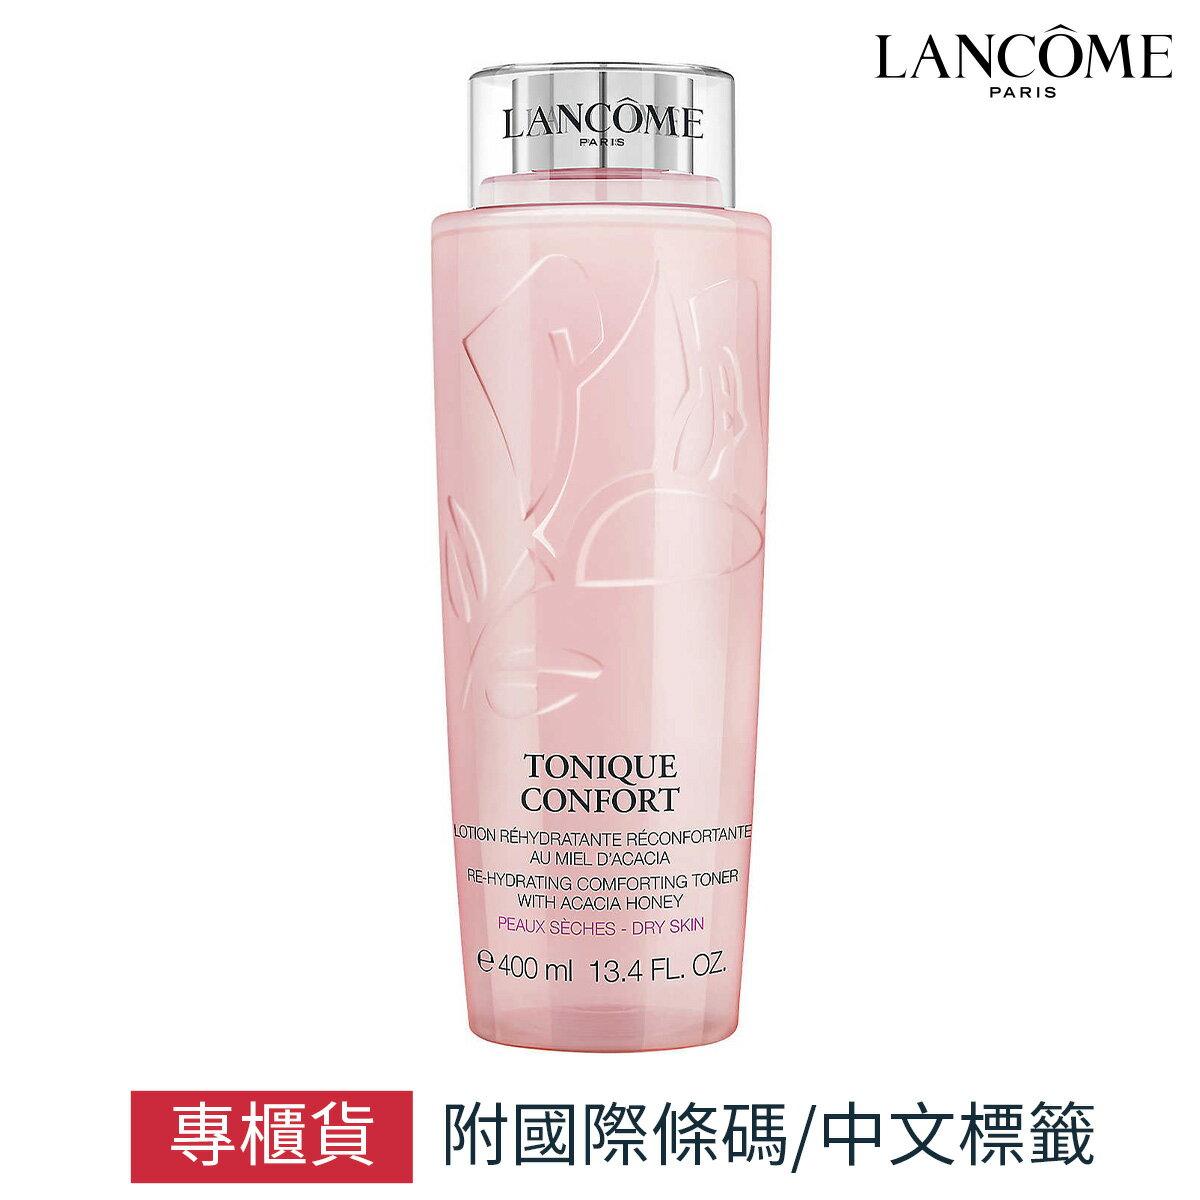 LANCOME 蘭蔻 溫和保濕化妝水 400ml 粉水 乾性肌 基礎保養【SP嚴選家】